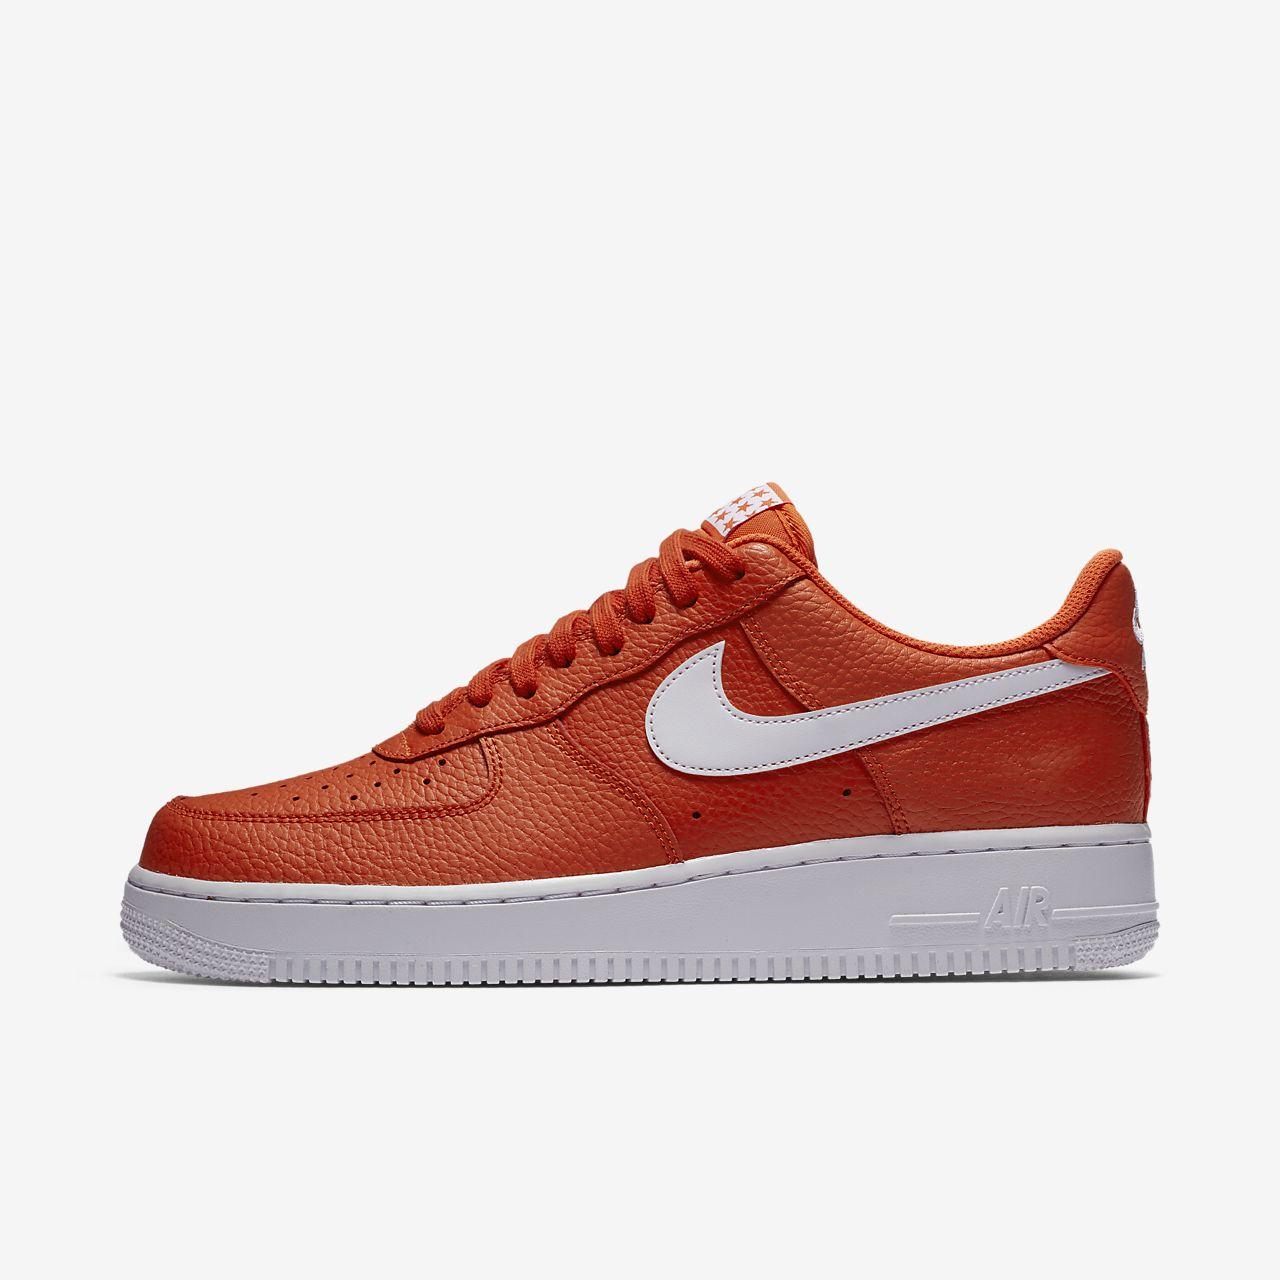 barato original Nike Air Force 1 07 Mediados Mens Superiores De Calzado 95 £ 000 wiki venta recomienda JMrgj